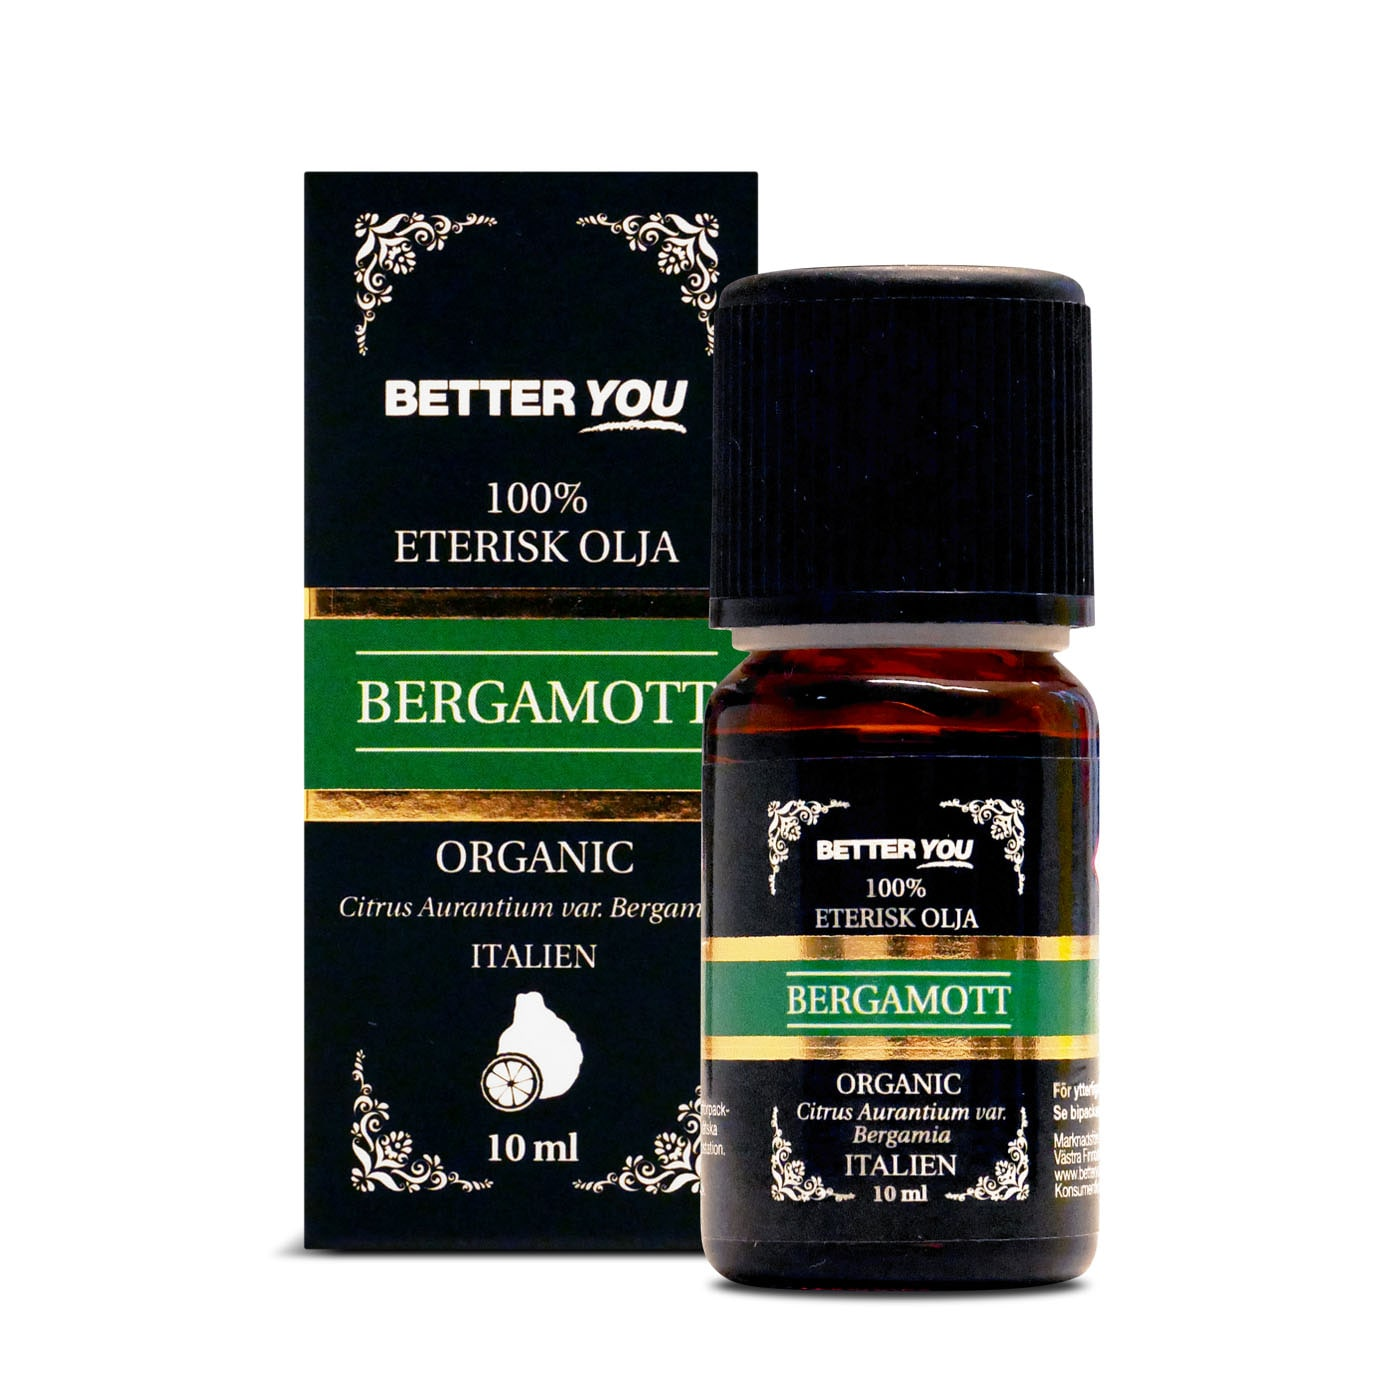 Bergamottolja EKO Eterisk - 10 ml